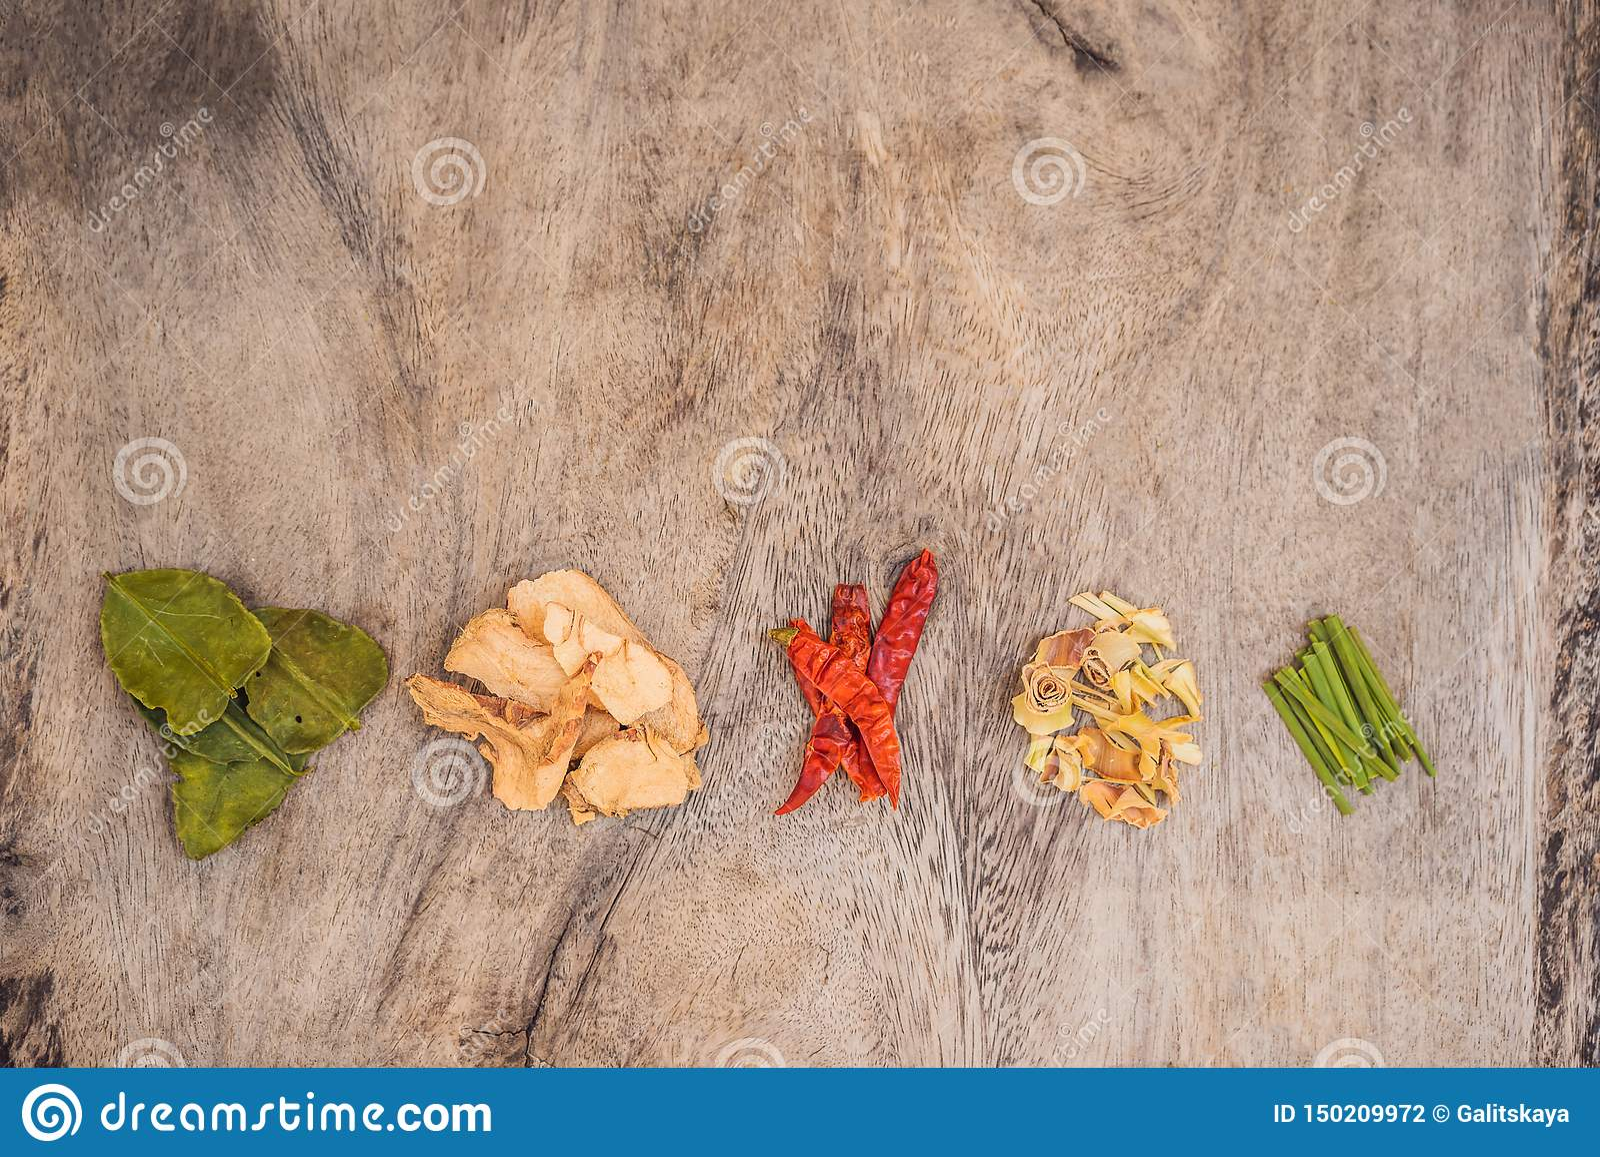 Bestandteile f?r popul?res thail?ndisches Suppe Tom-yum kung Kalk, Galangal, roter Paprika, Kirschtomate, Lemongras und Kaffirkal